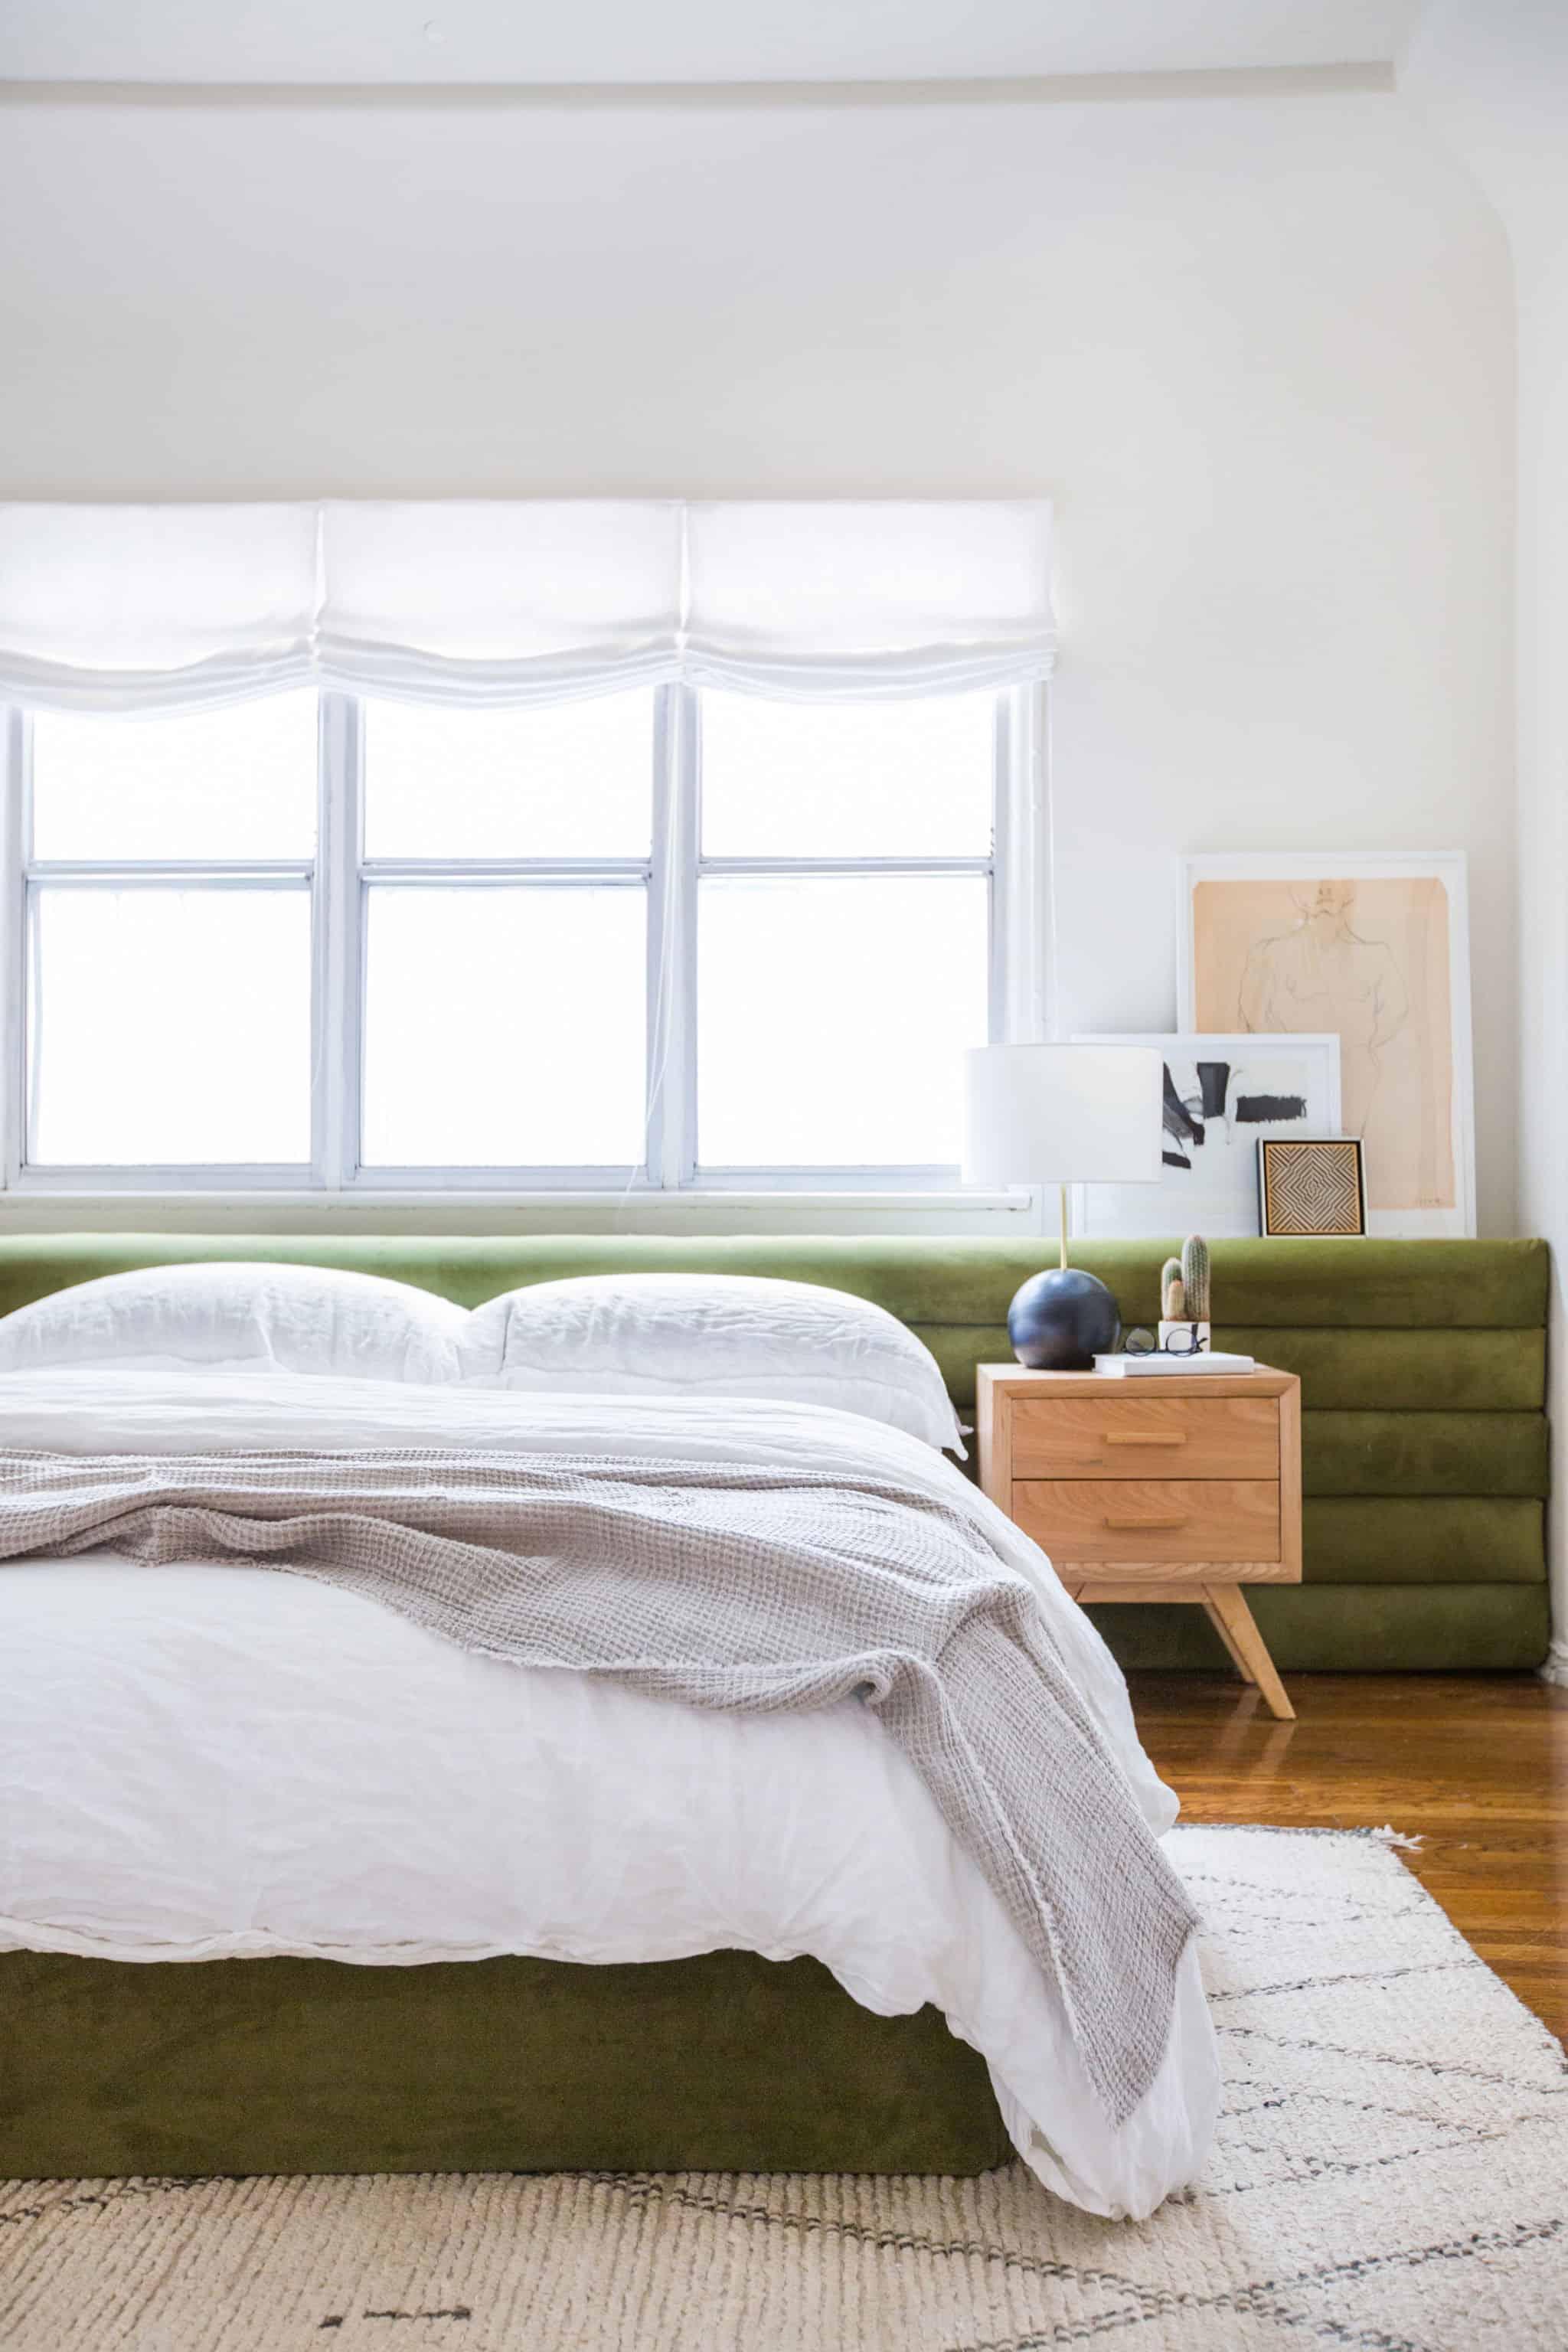 emily-henderson_sapira-mattress_diy-headboard_brady-tolbert_bedroom_green-velvet_channel-tufting_channel-tufted_masculine_boho_chic_headboard_6